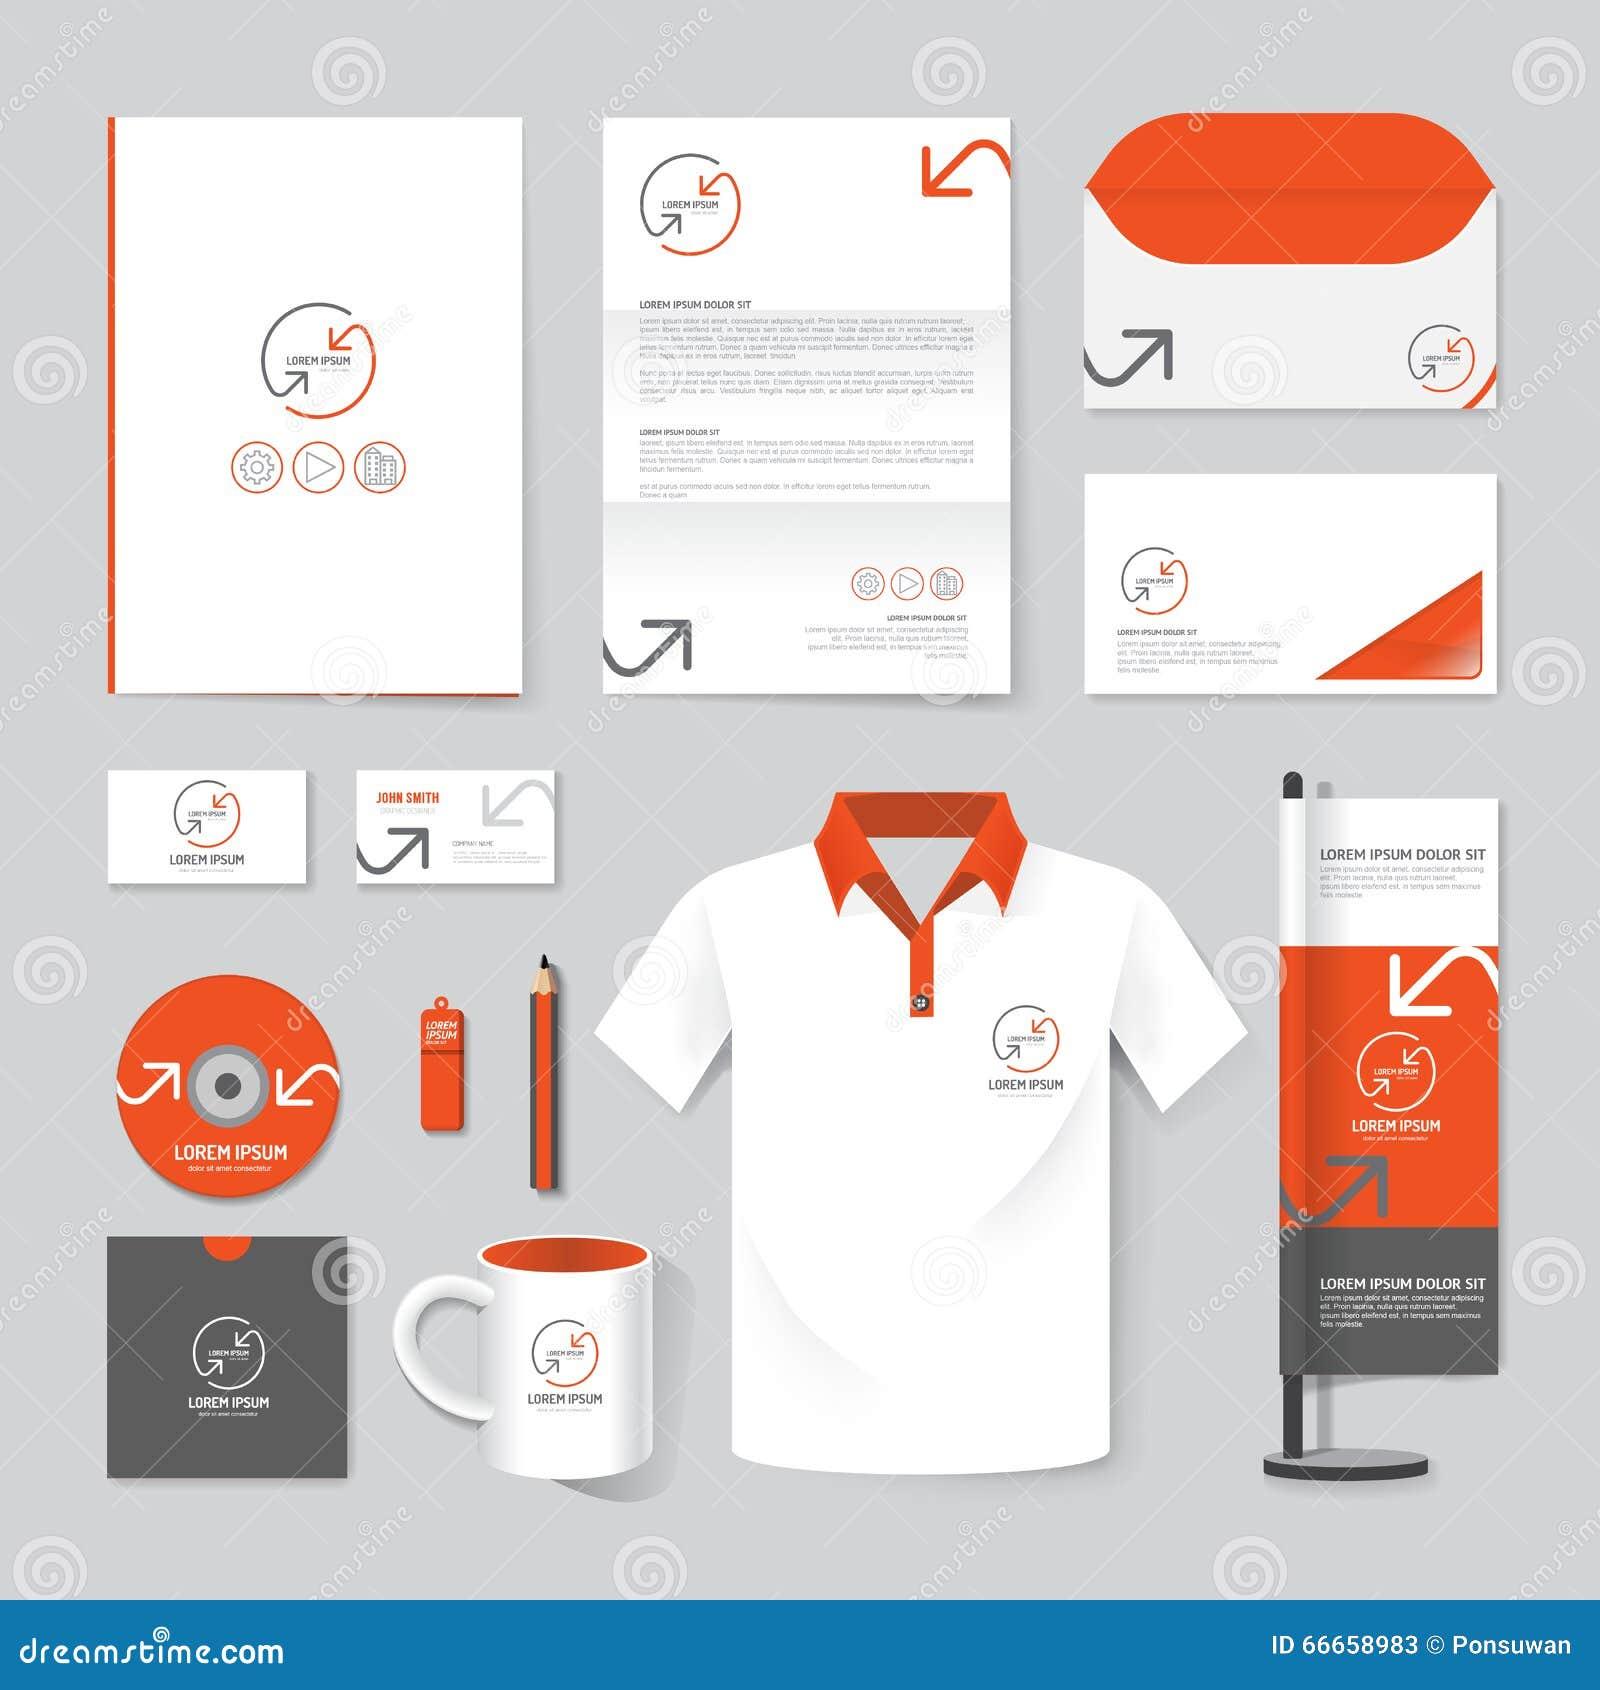 Shirt design template size - Shirt Design Template Size Vector Brochure Flyer Magazine Folder T Shirt Cover Booklet Stock